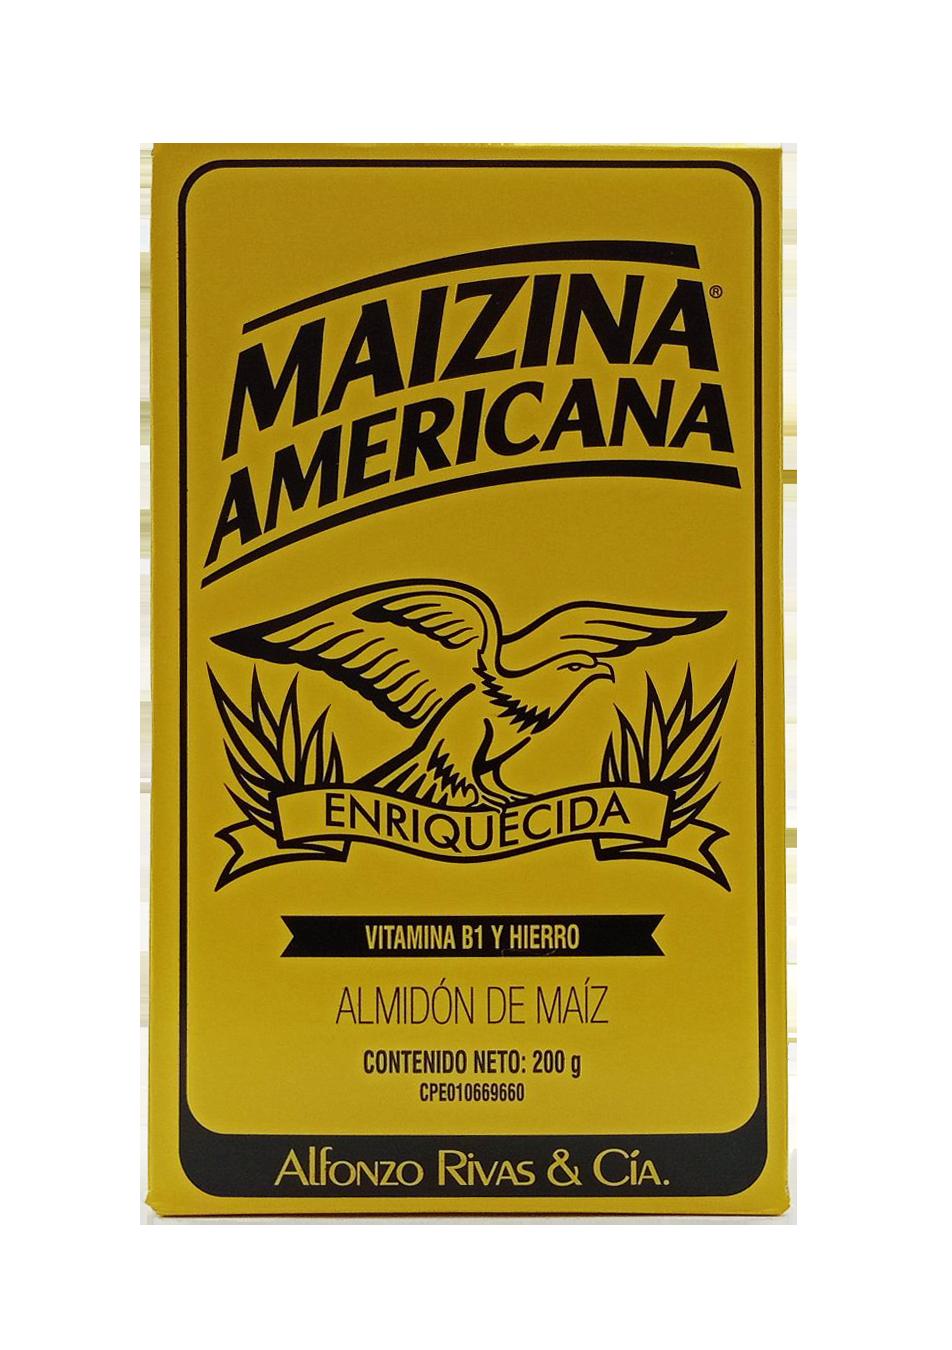 MAIZINA AMERICANA 200GR